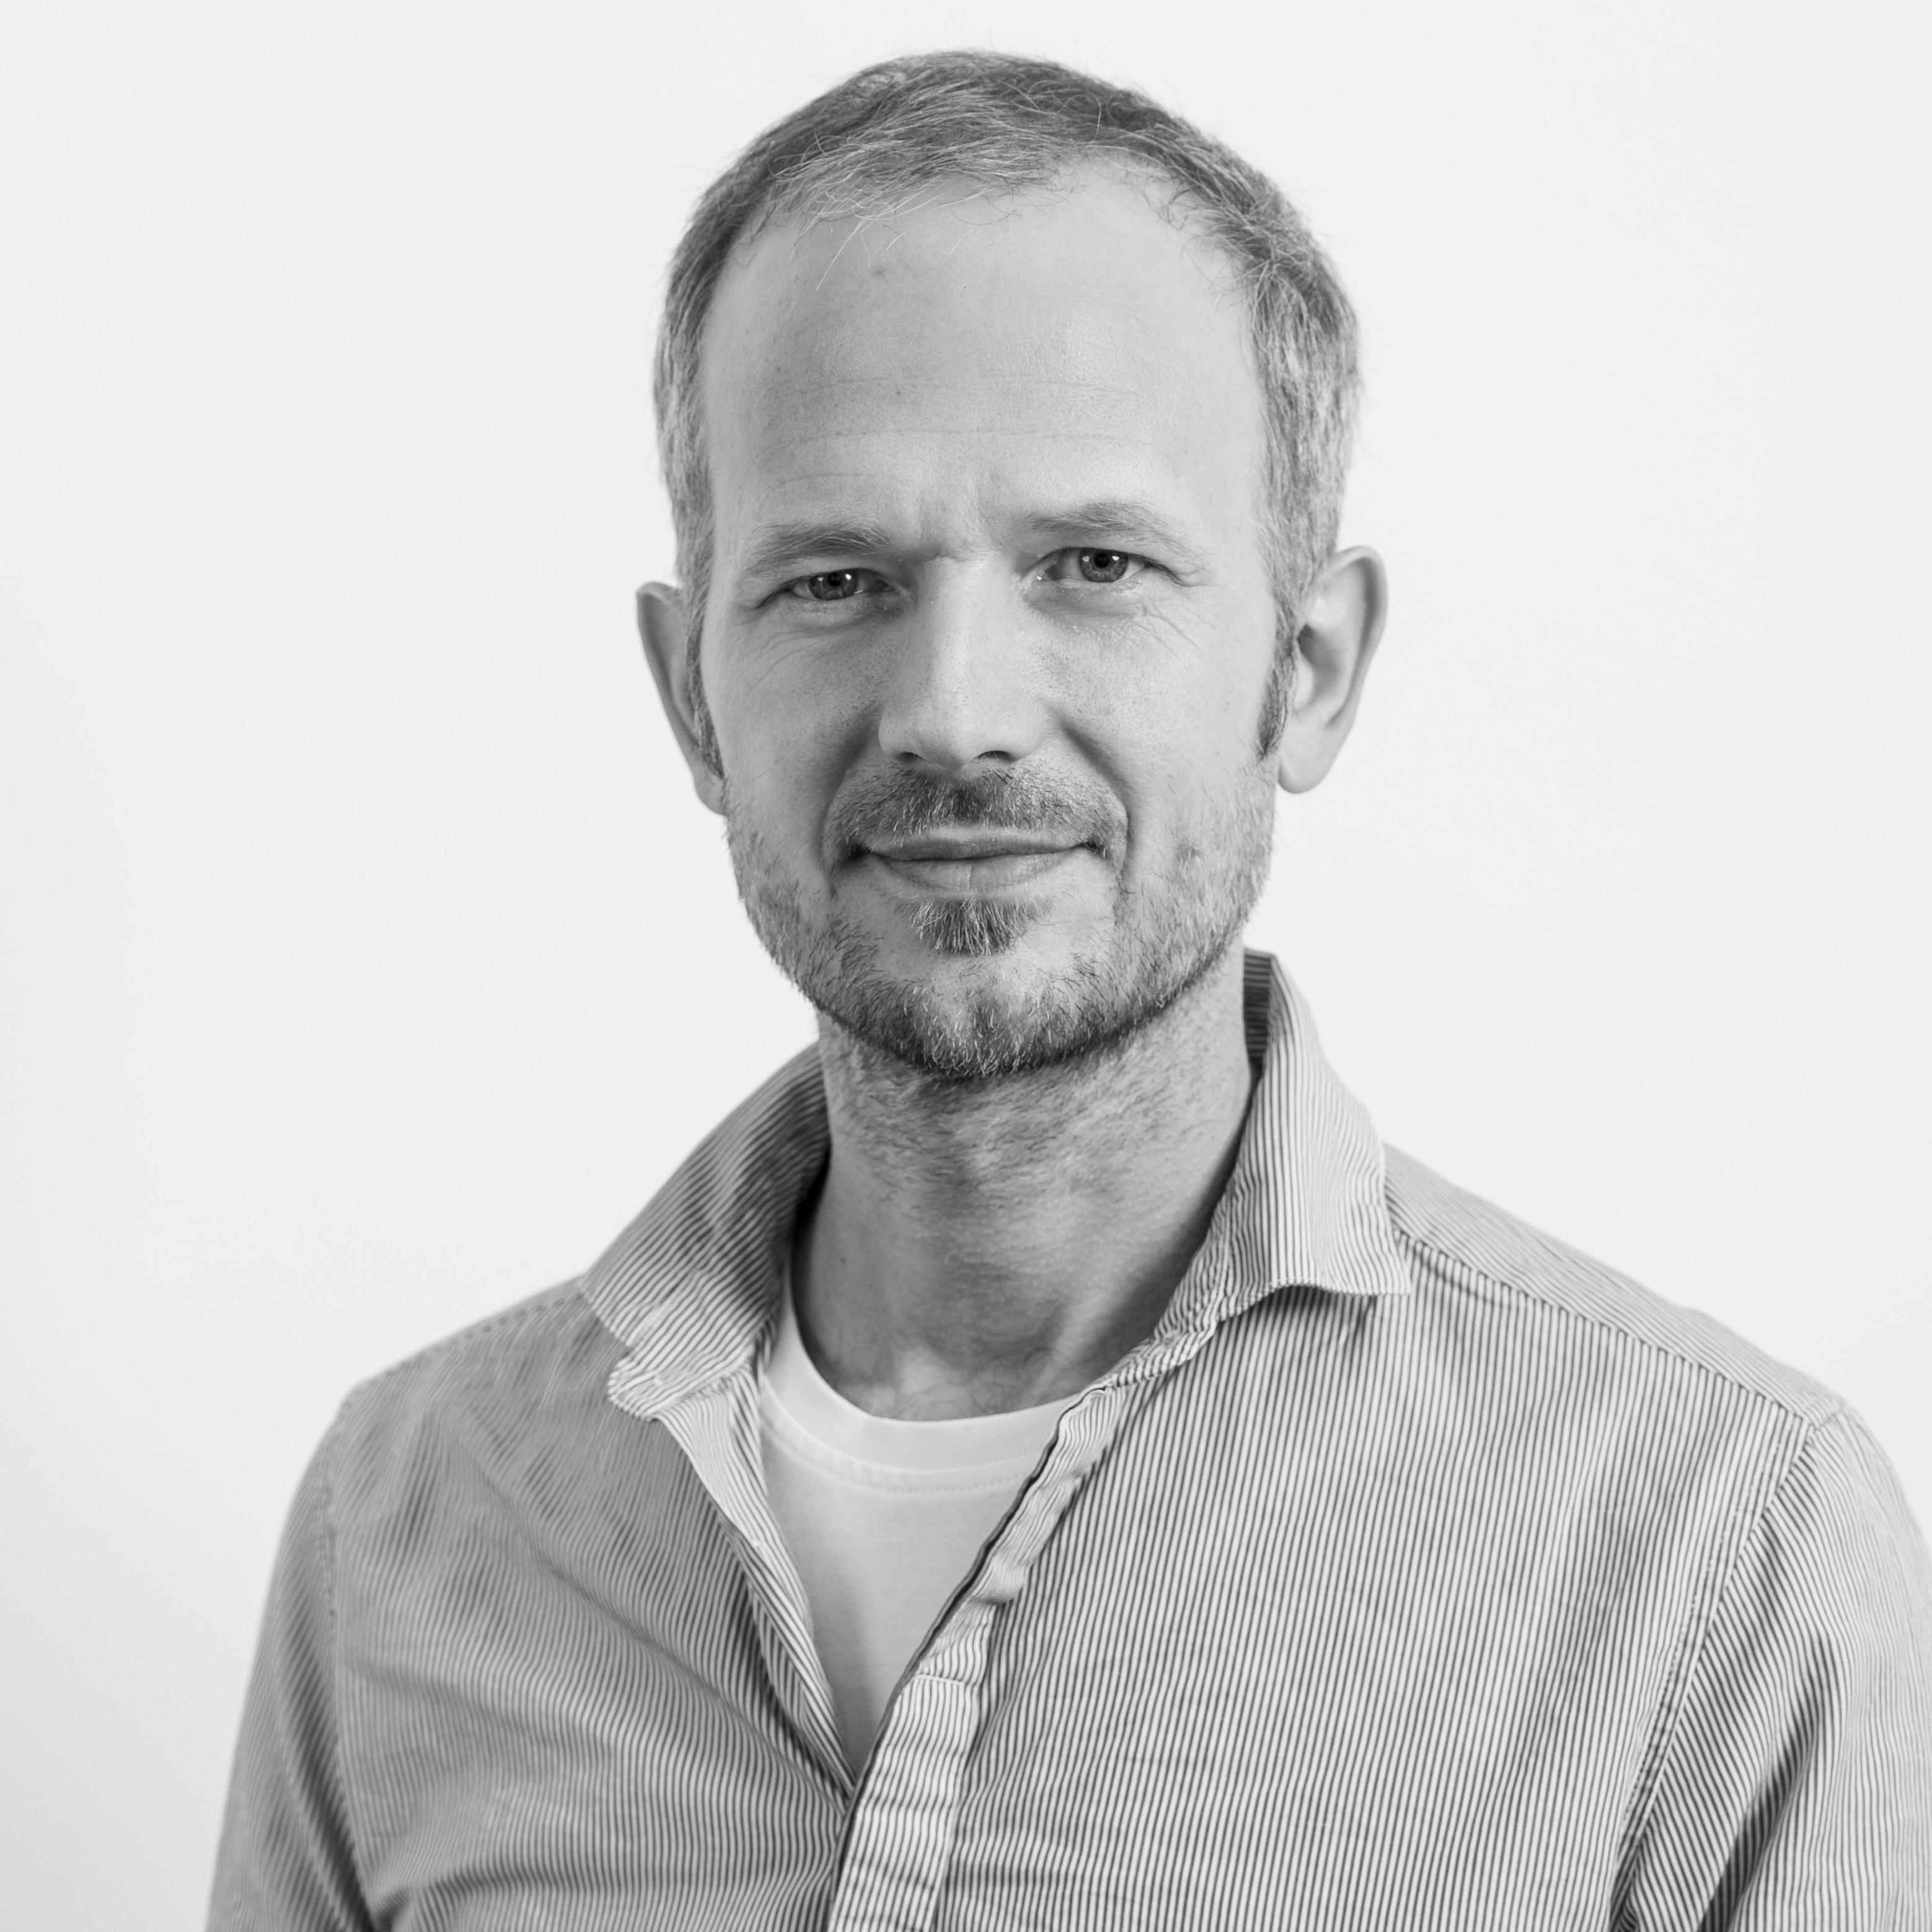 Jens Hüttner - TEMEDOS Grinbergtherapie  Berlin Charlottenburg